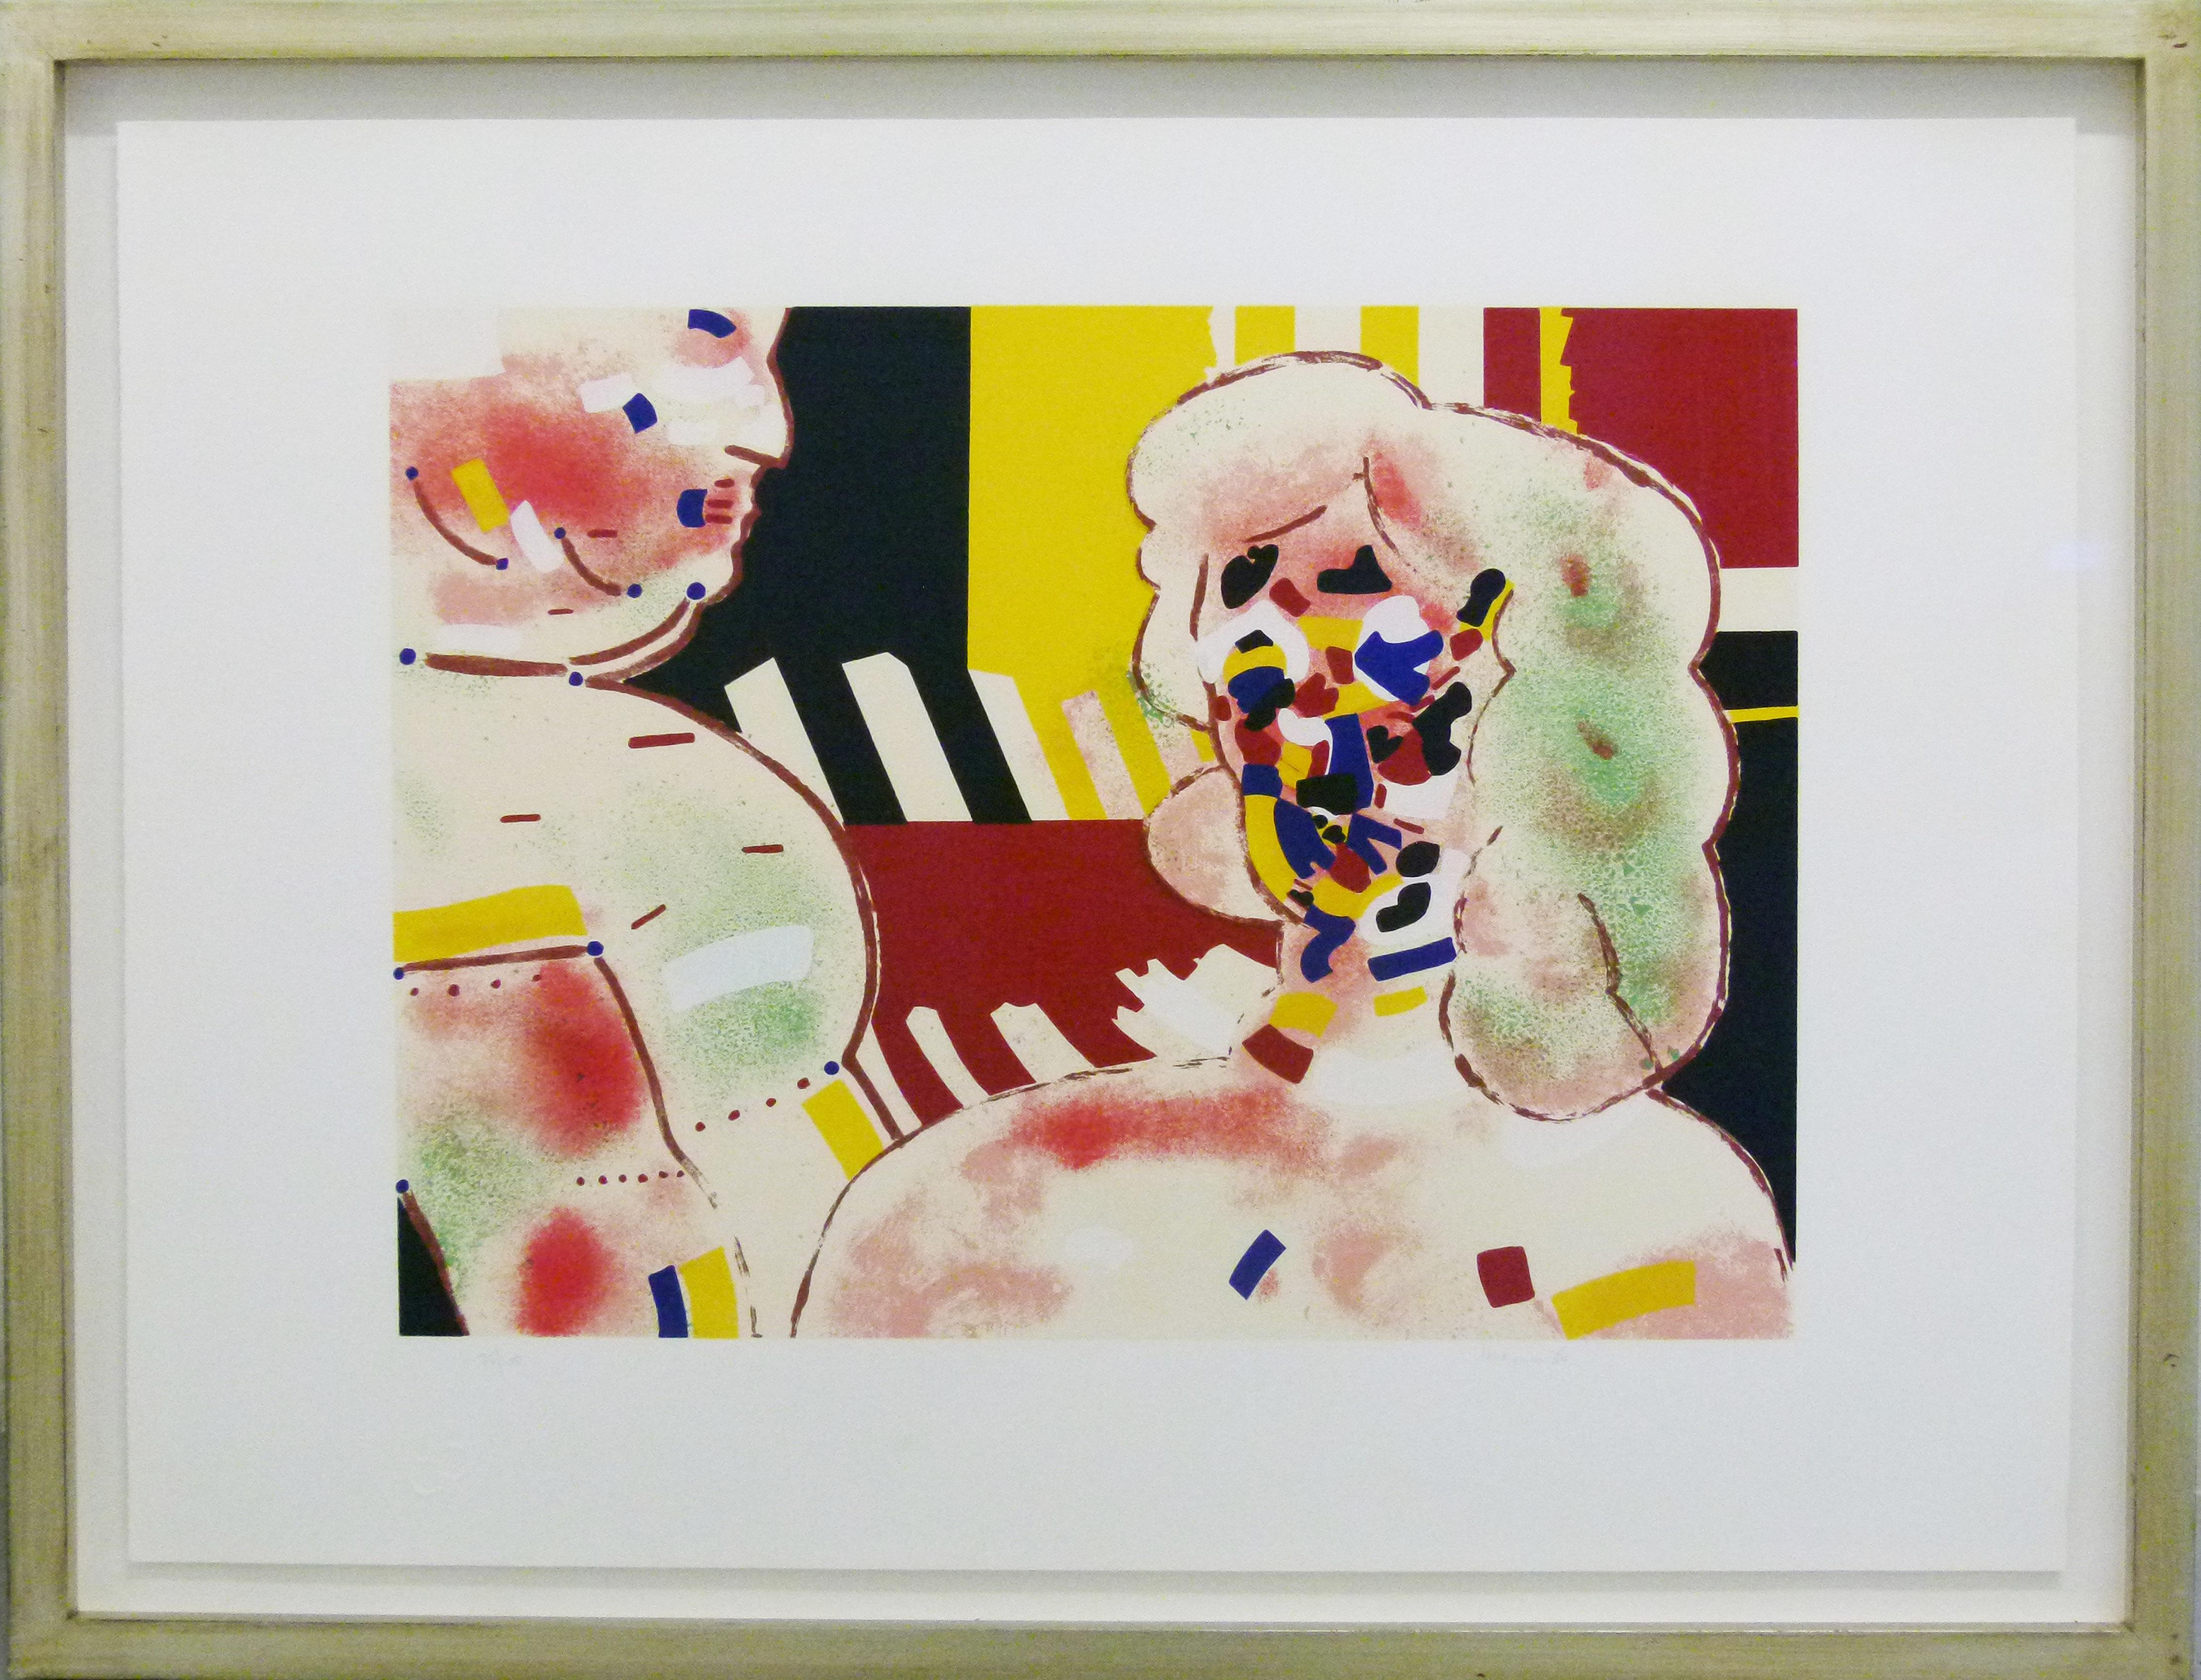 Robert Hodgins, UK-SA (1920- 2010), Encounter, Screenprint 75-100, signed,40cm x 49cm.